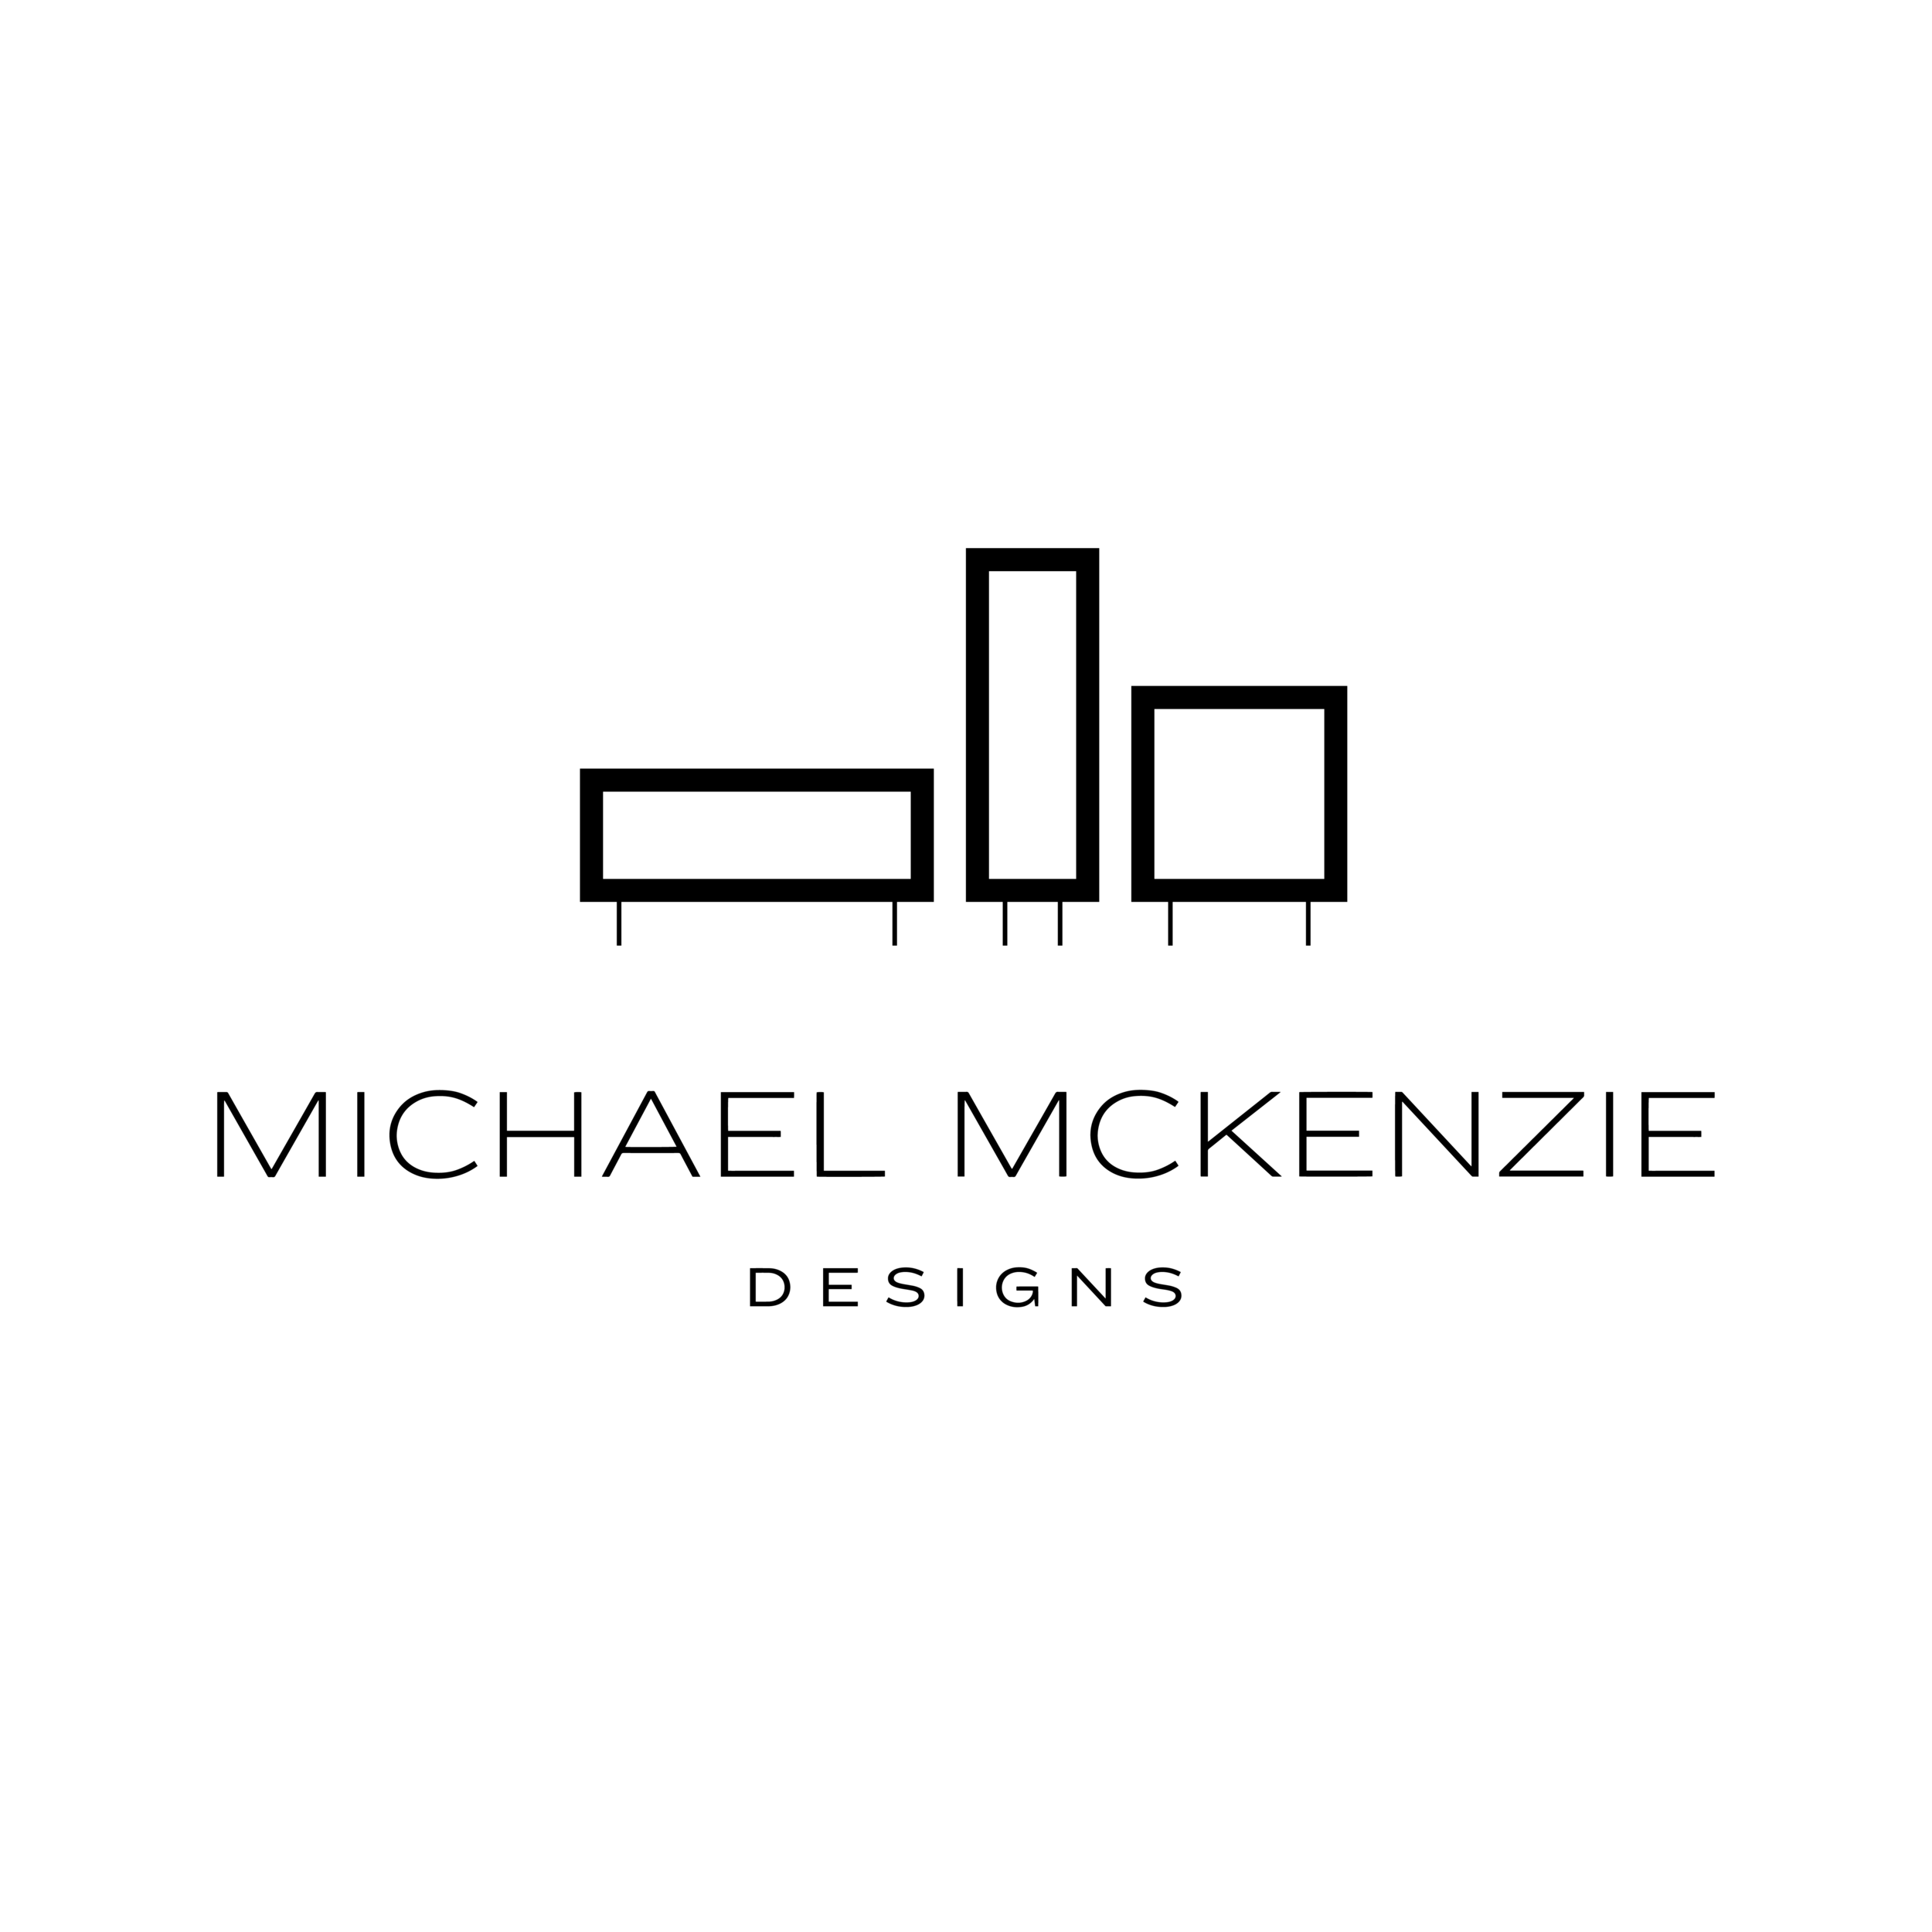 Michael McKenzie Designs logo by Fetch Design